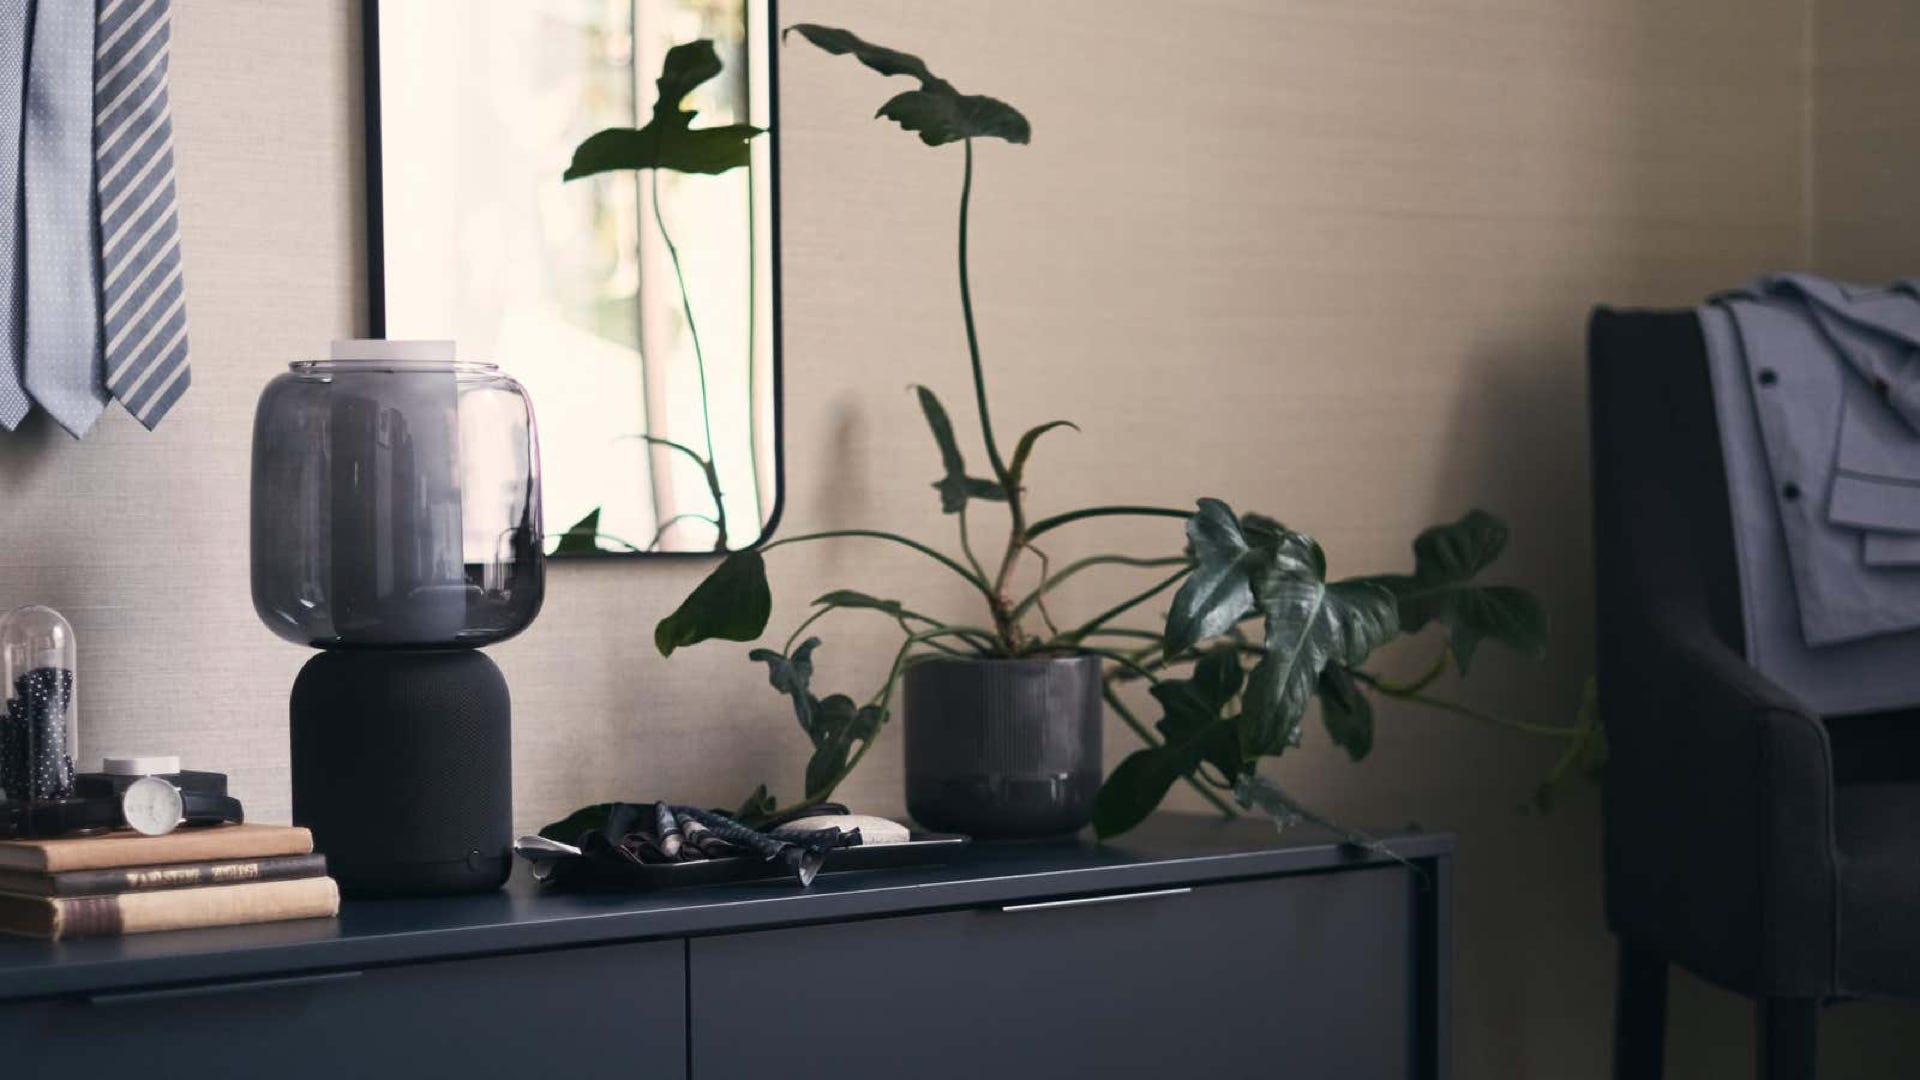 Sonos IKEA lamp speaker